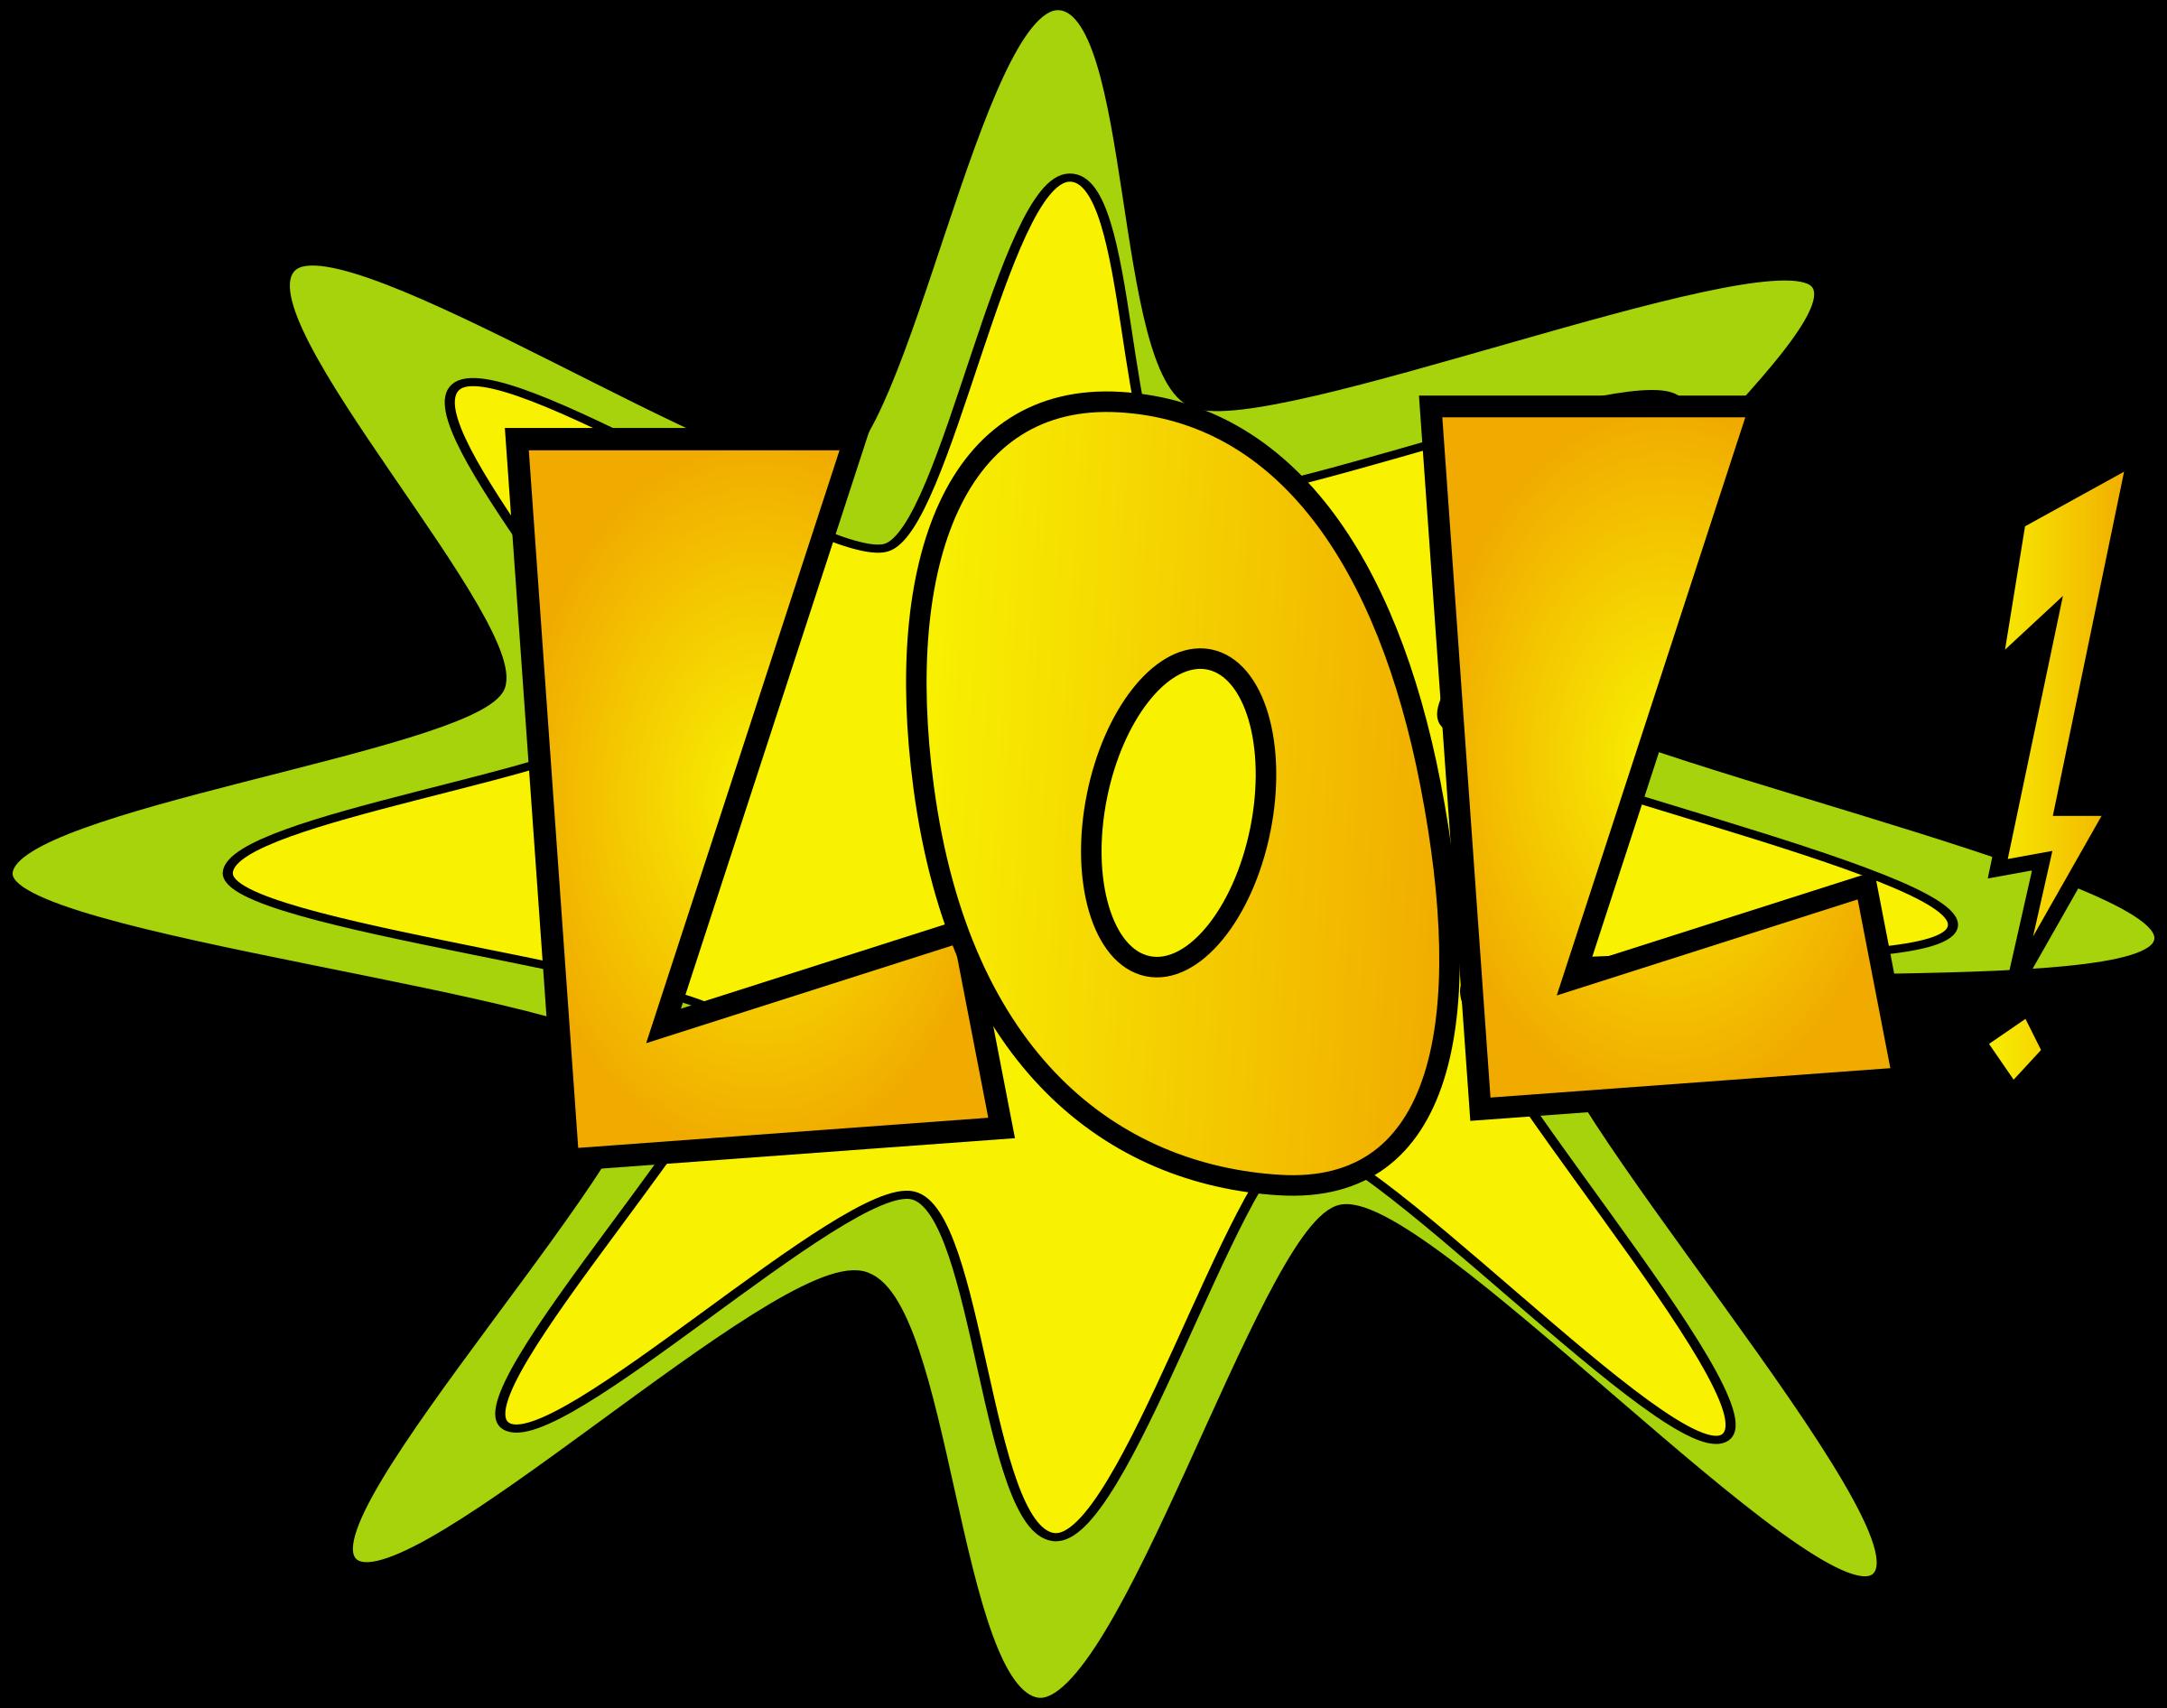 Lol laughing out loud. Surprise clipart symbol